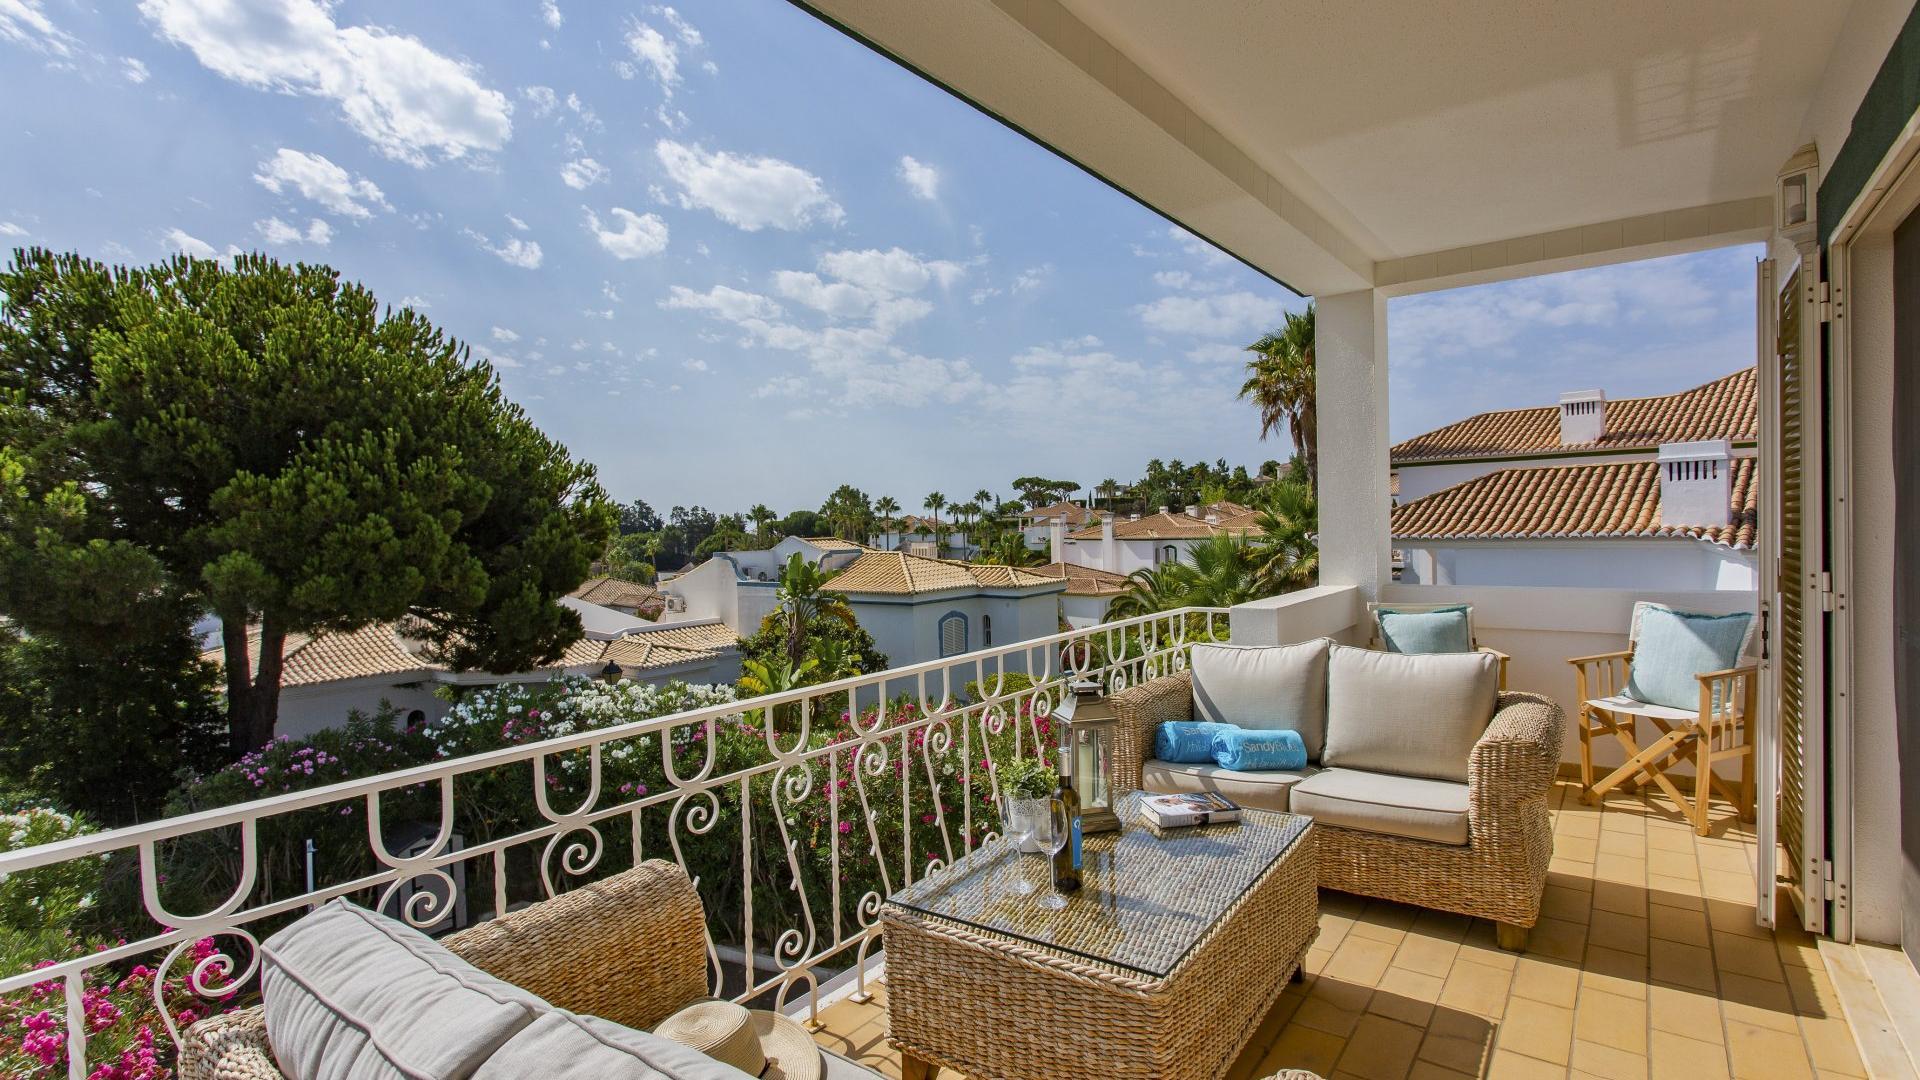 Apartment Treetop View - Encosta do Lago, Quinta do Lago, Algarve - Villa_Treetop_View_Outdoors_1.jpg